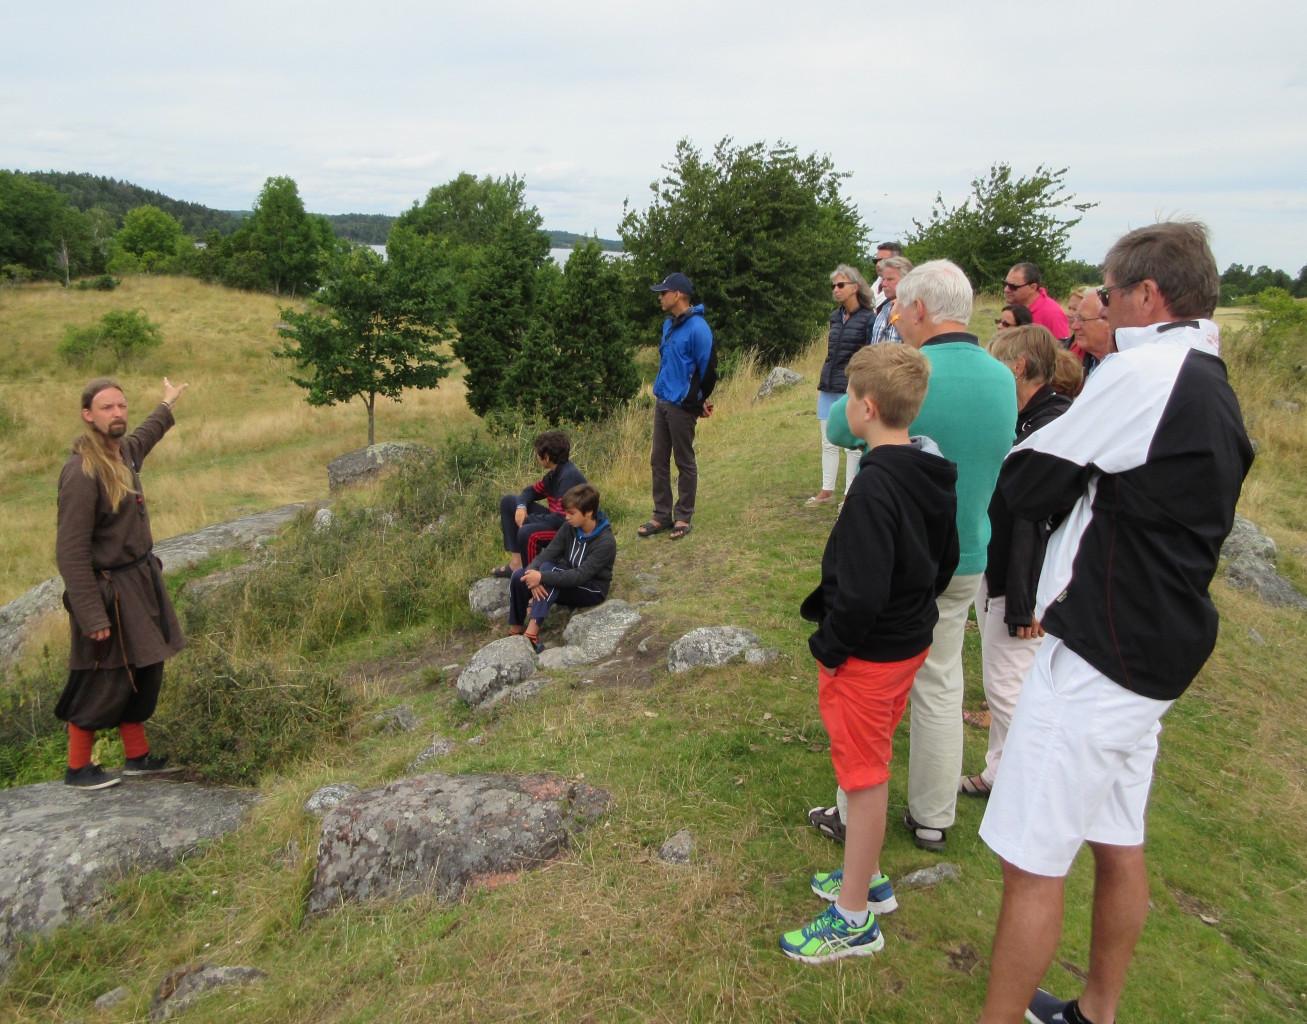 Walking tour around the ancient Viking burial mounds in Birka, Sweden. * Photo: Heidi Sarna